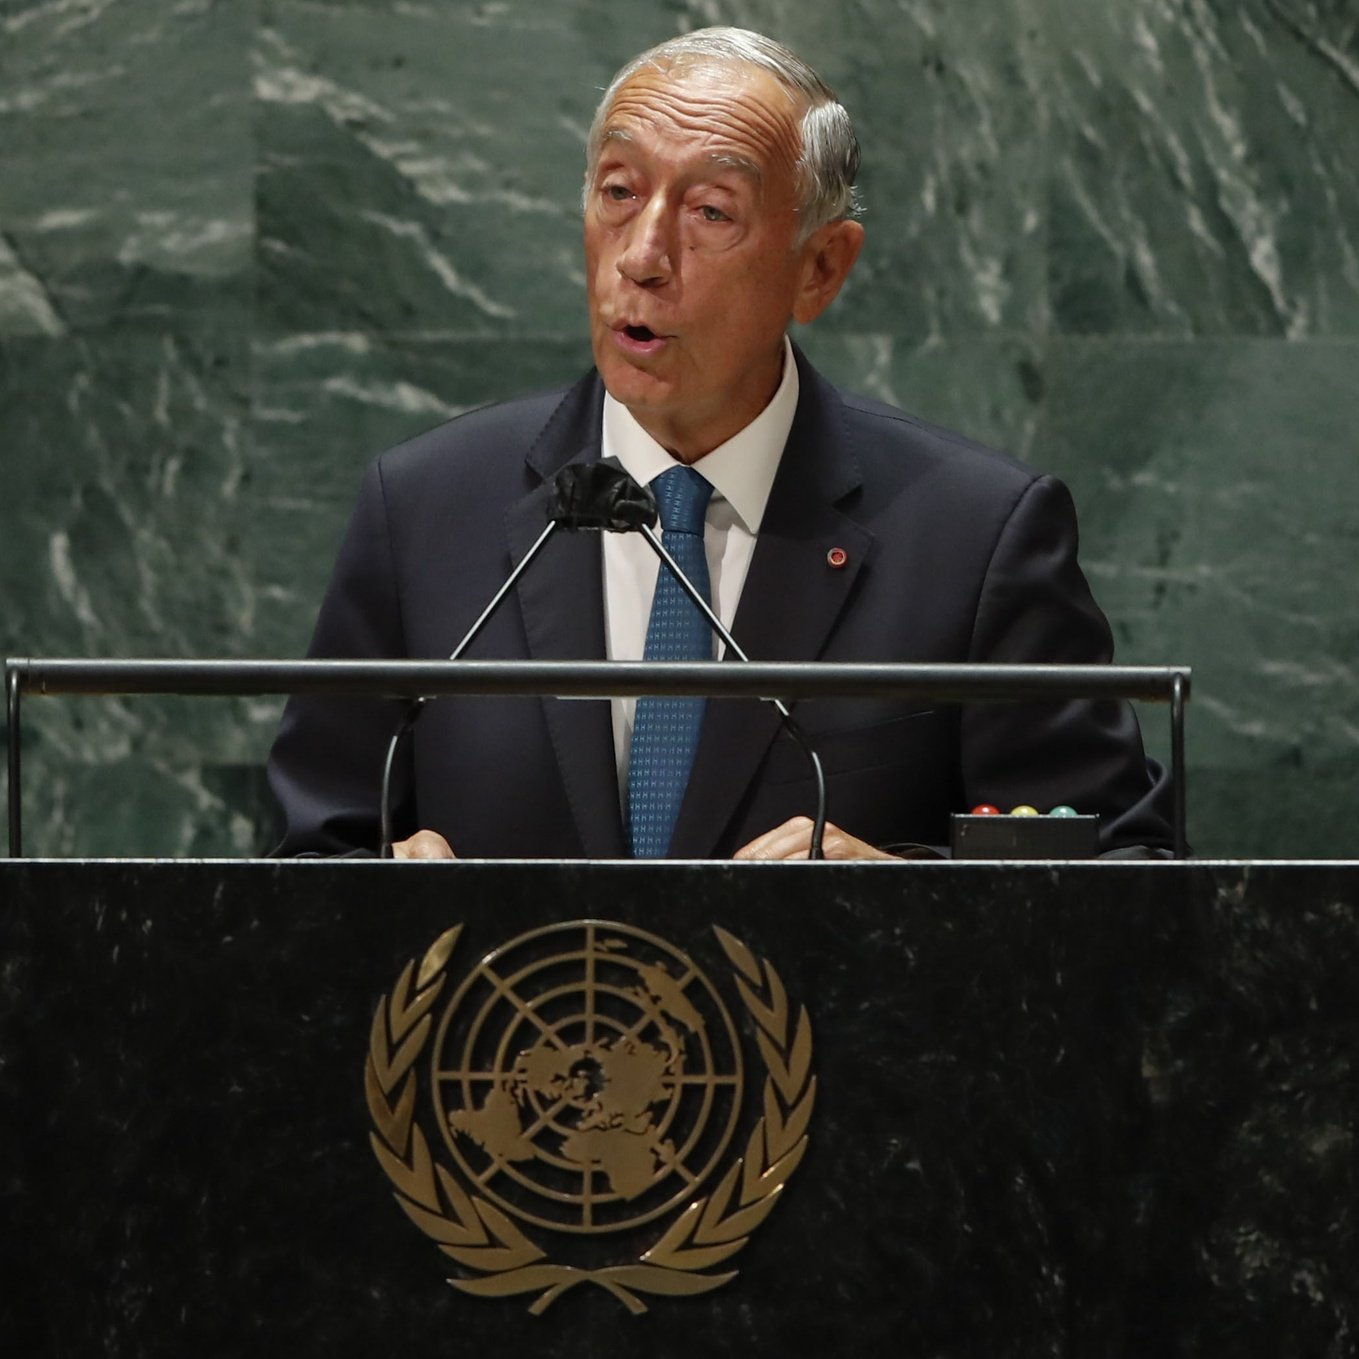 epa09479718 Portugal's President Marcelo Rebelo de Sousa addresses the 76th Session of the UN General Assembly in New York City, USA, 21 September 2021.  EPA/EDUARDO MUNOZ / POOL